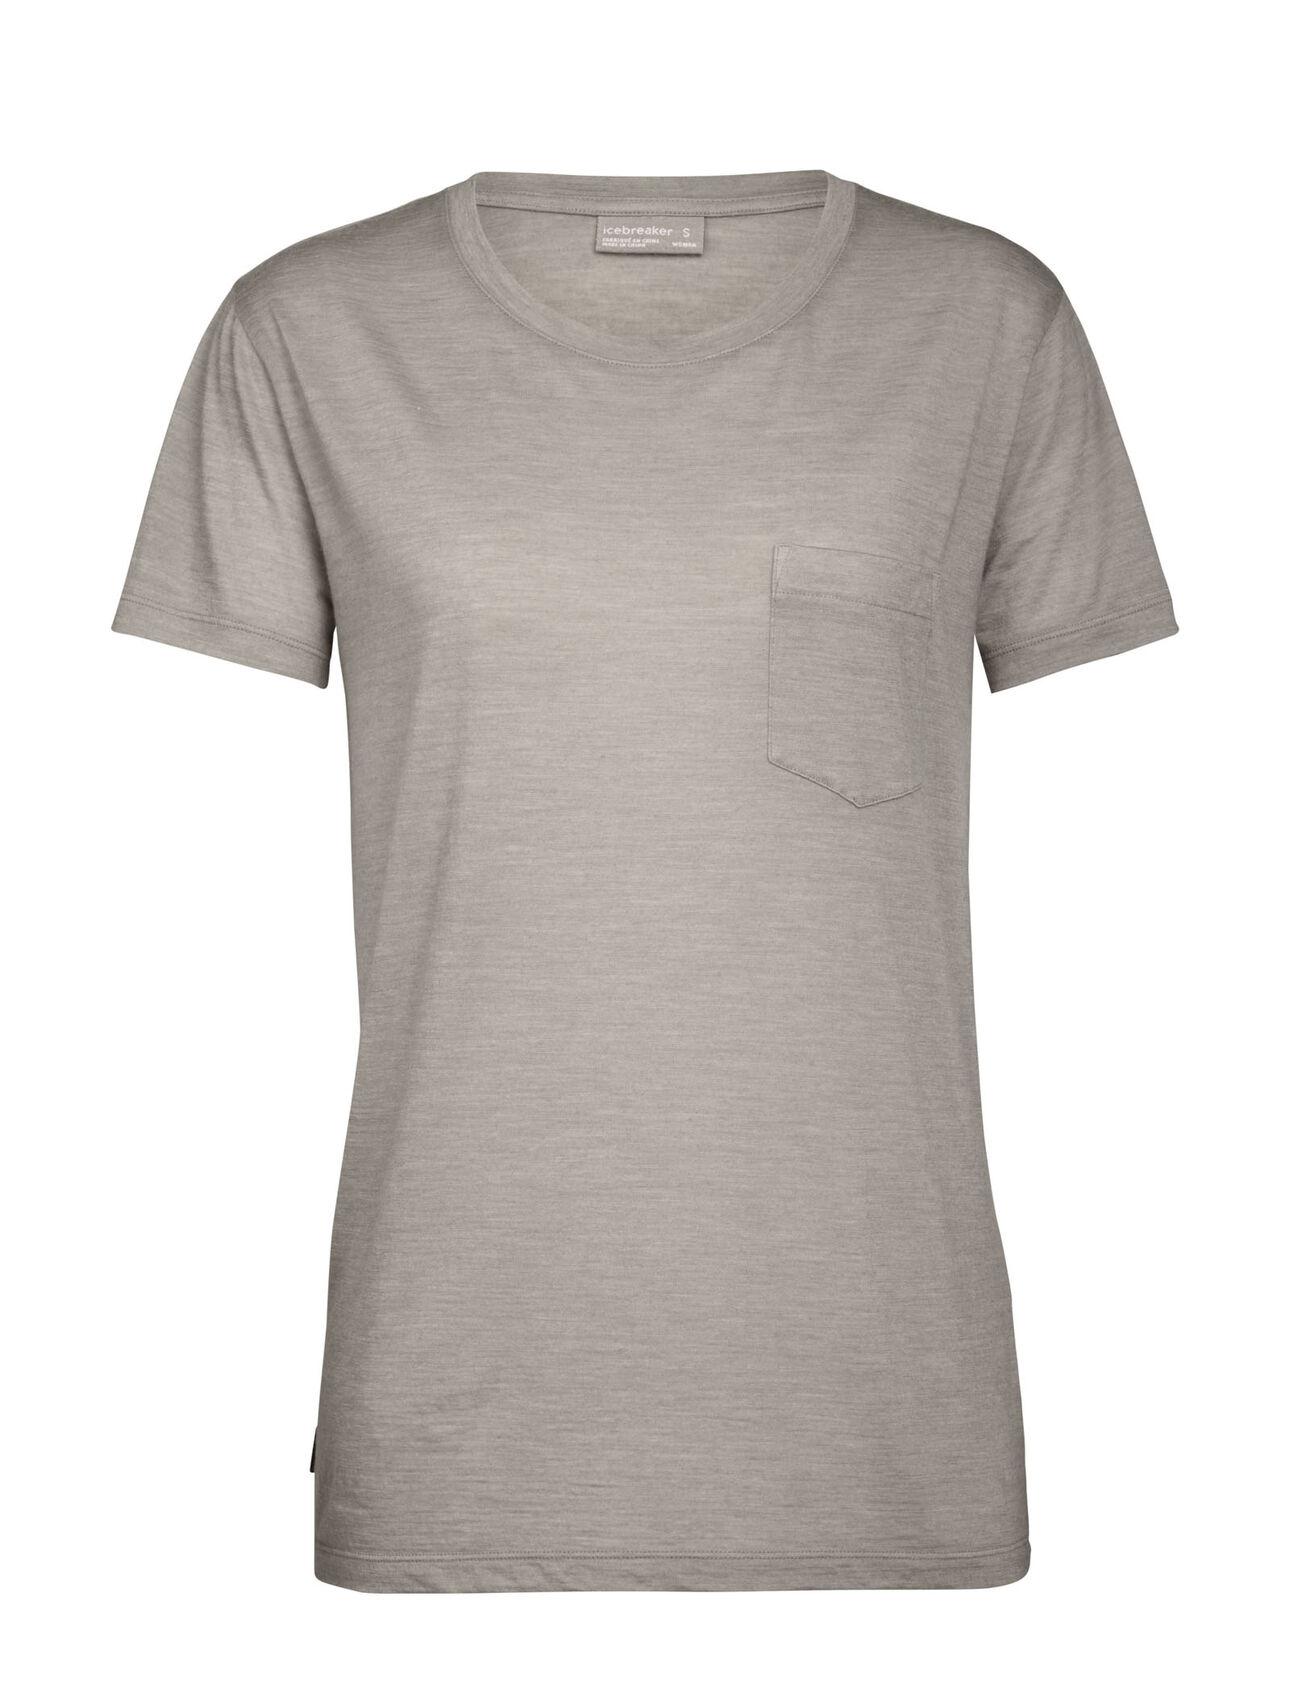 Merino Nature Dye Drayden Short Sleeve Pocket Crewe T-Shirt